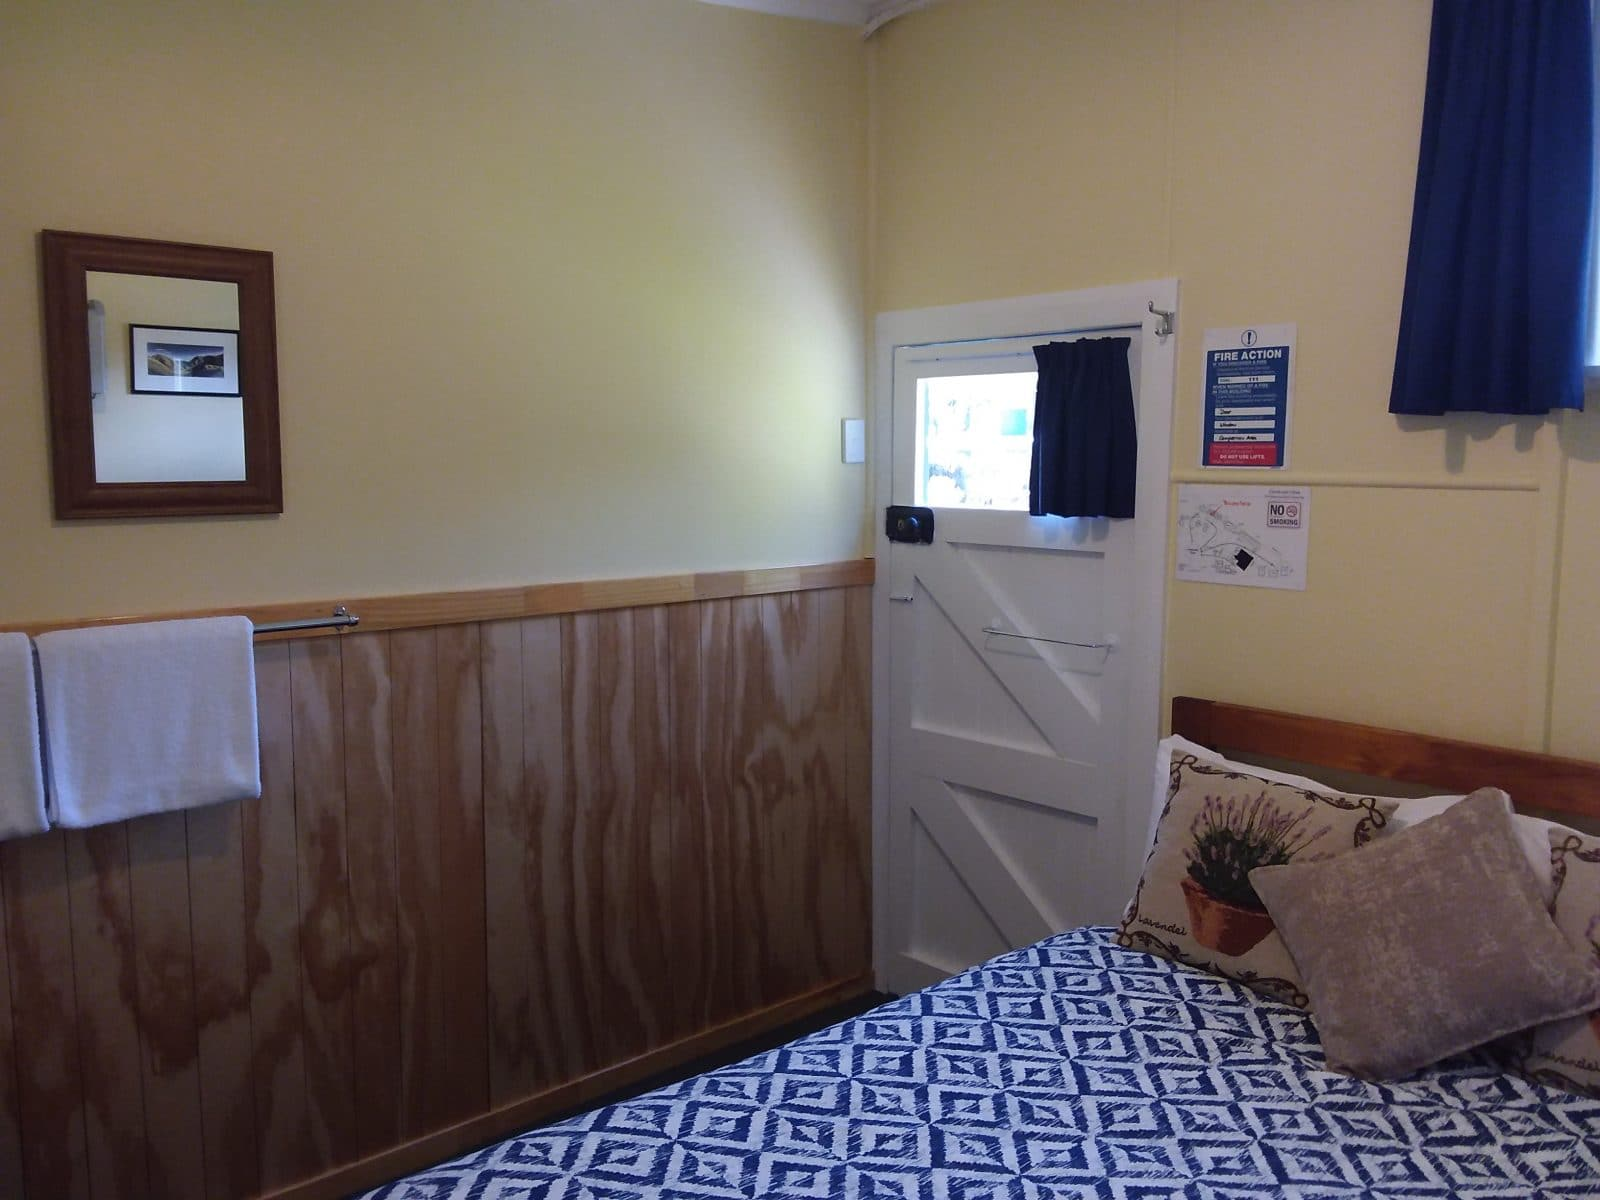 Cabin 3 pic 4